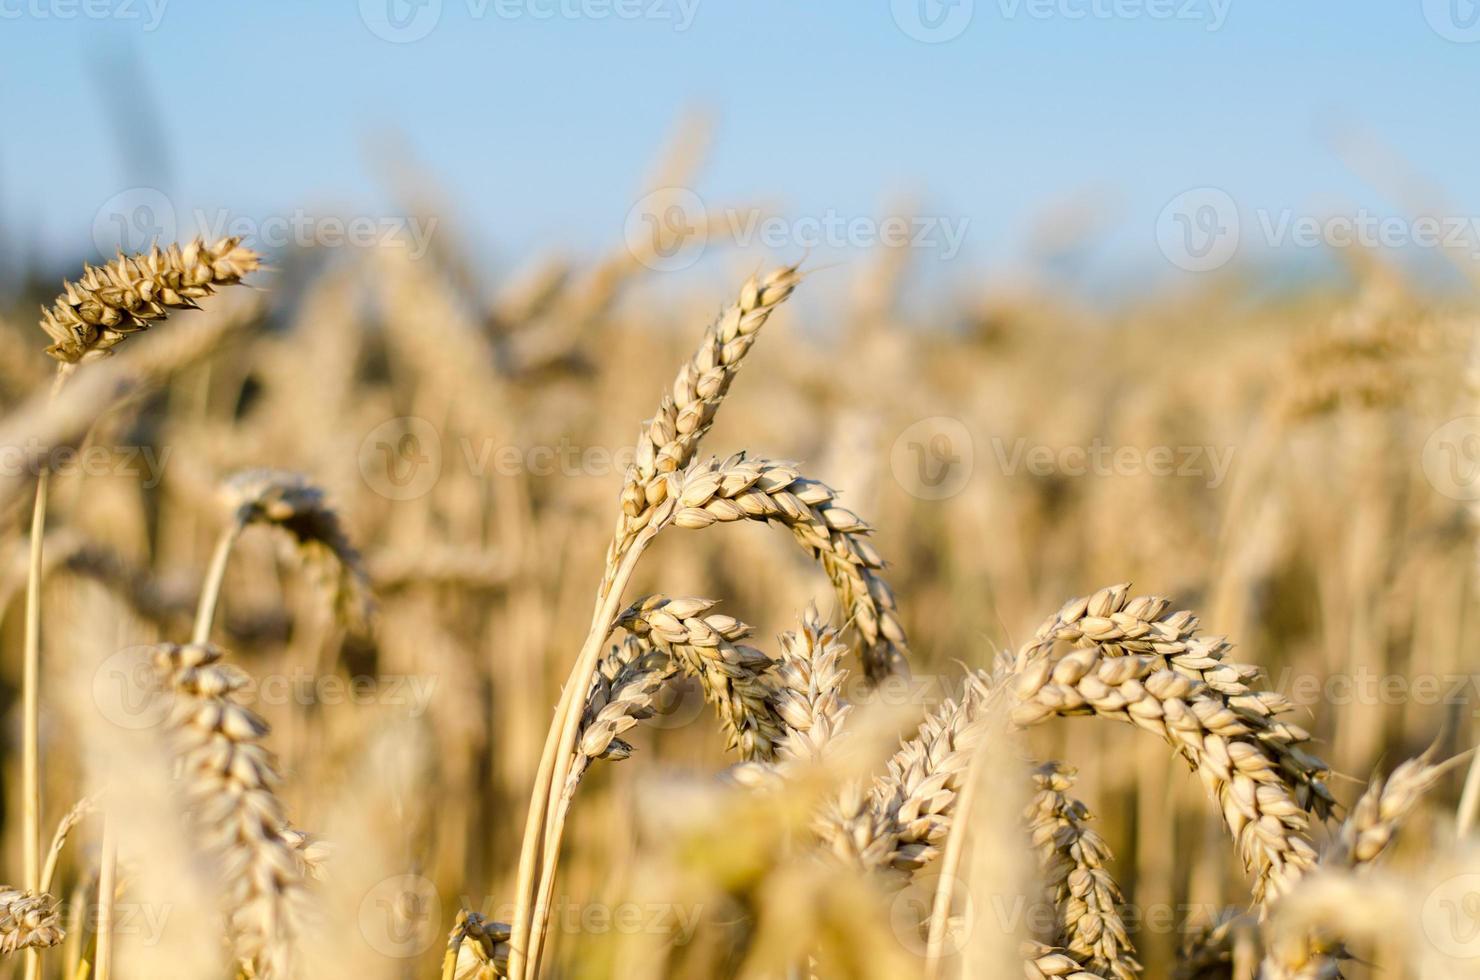 majsfält - växande majs foto